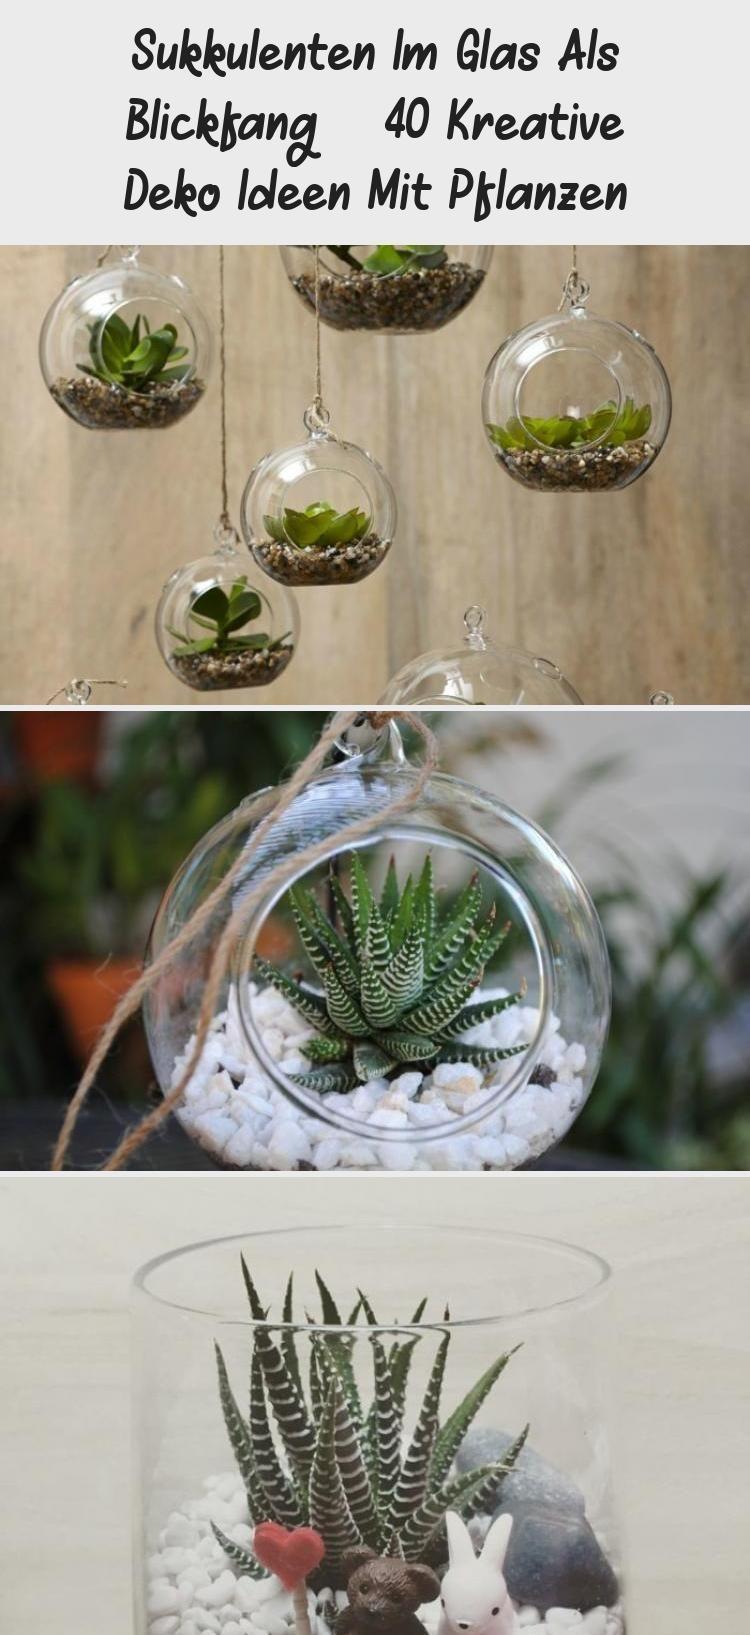 Sukkulenten im Glas als Blickfang - 40 kreative Dekorationsideen mit Pflanzen